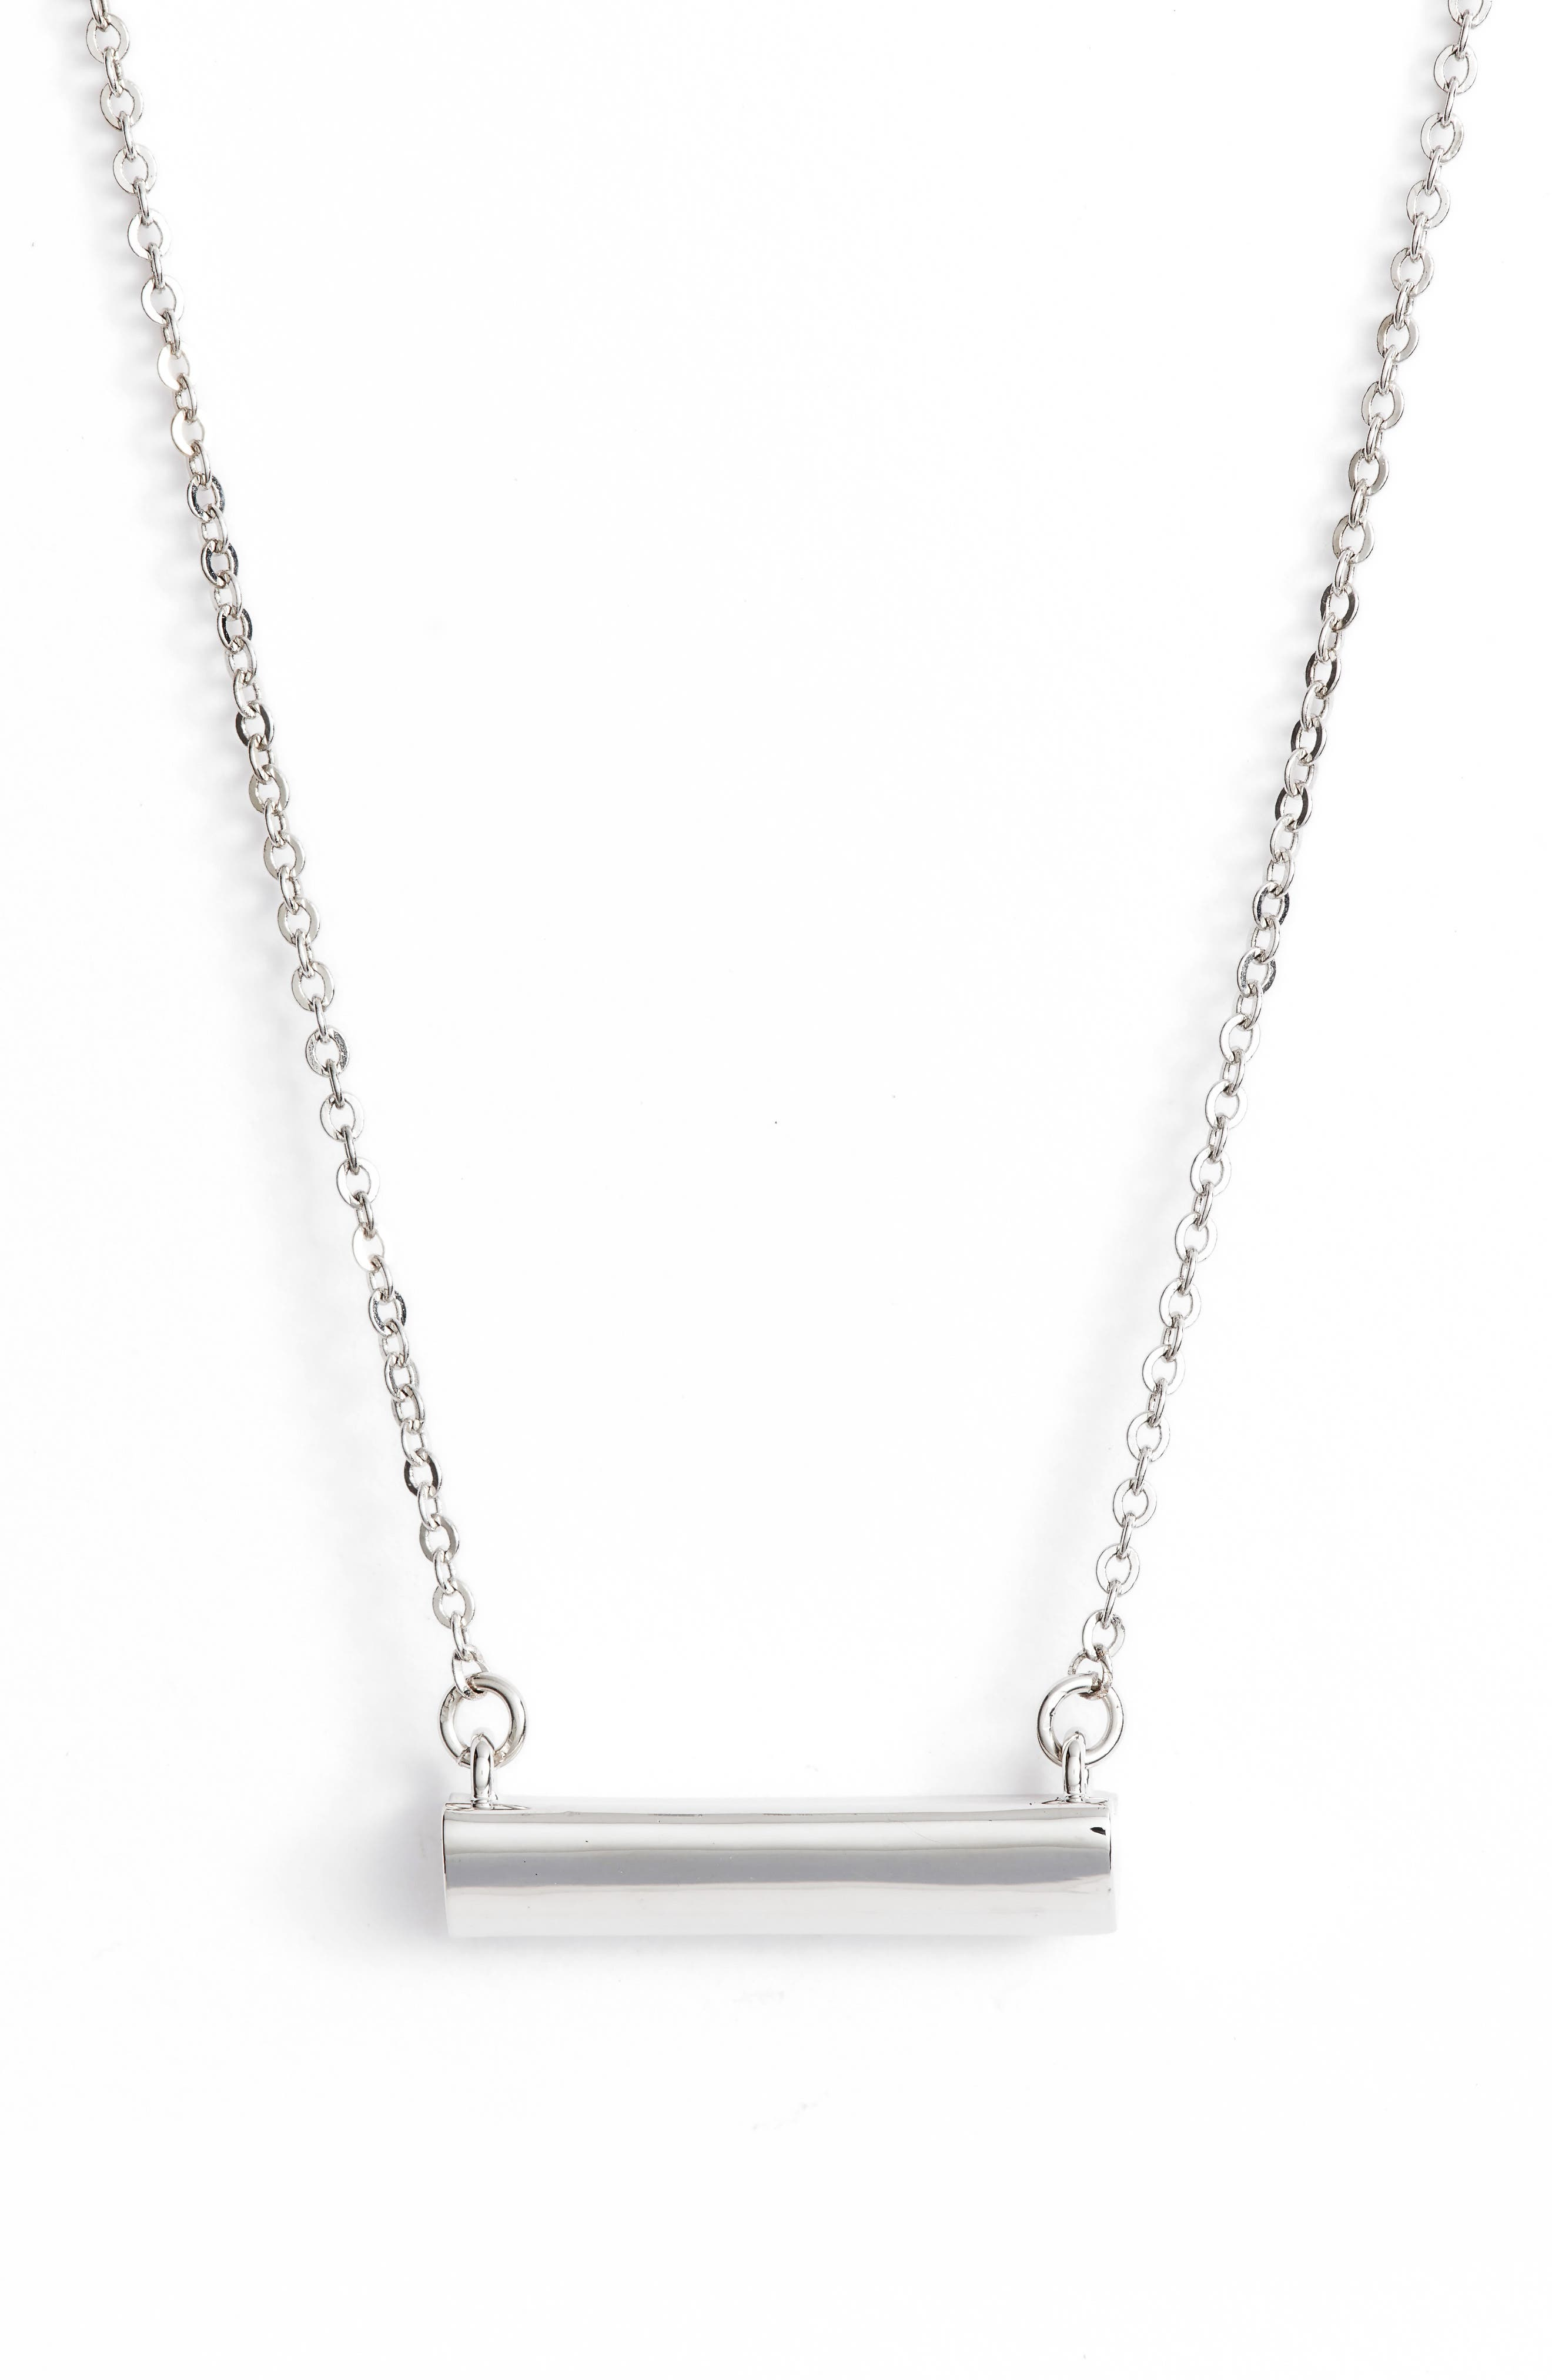 Heart Shaped Bar Pendant Necklace,                             Main thumbnail 1, color,                             SILVER